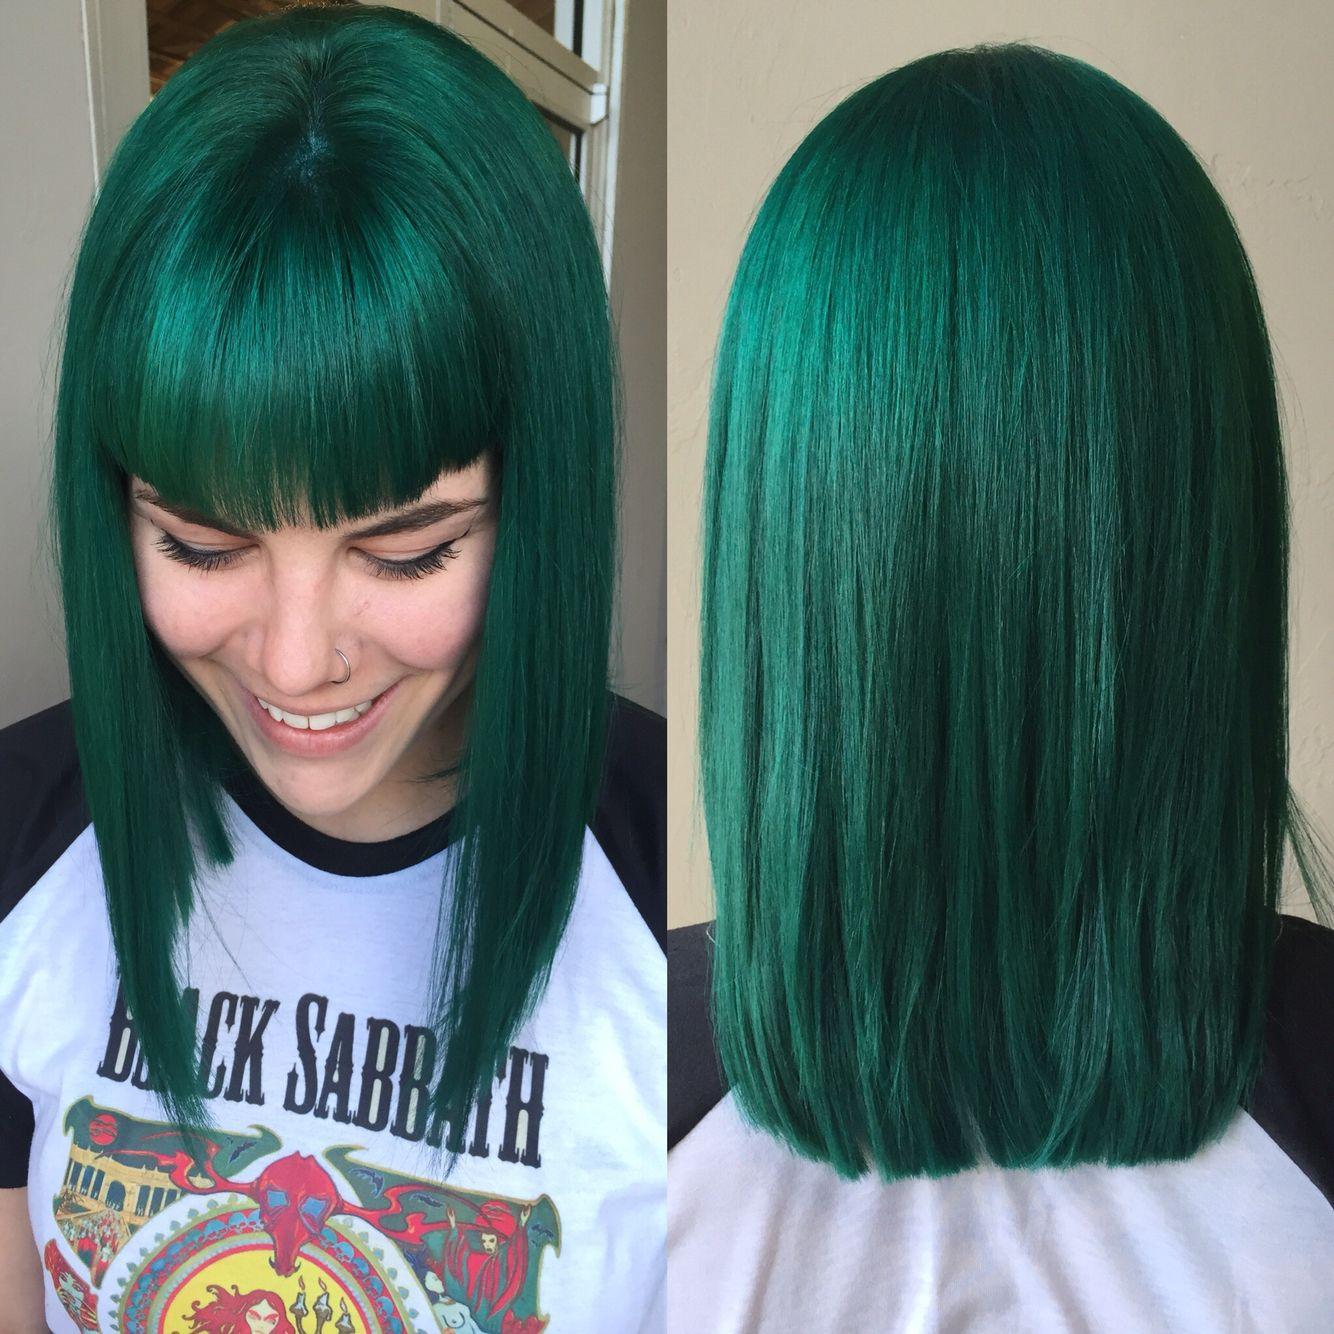 Pravanavivids Pravana Vivids Modern Salon Modernsalon Green Hair Color Betty Bangs Emeraldhair Hair Color Emeral Green Hair Hair Styles Green Hair Colors